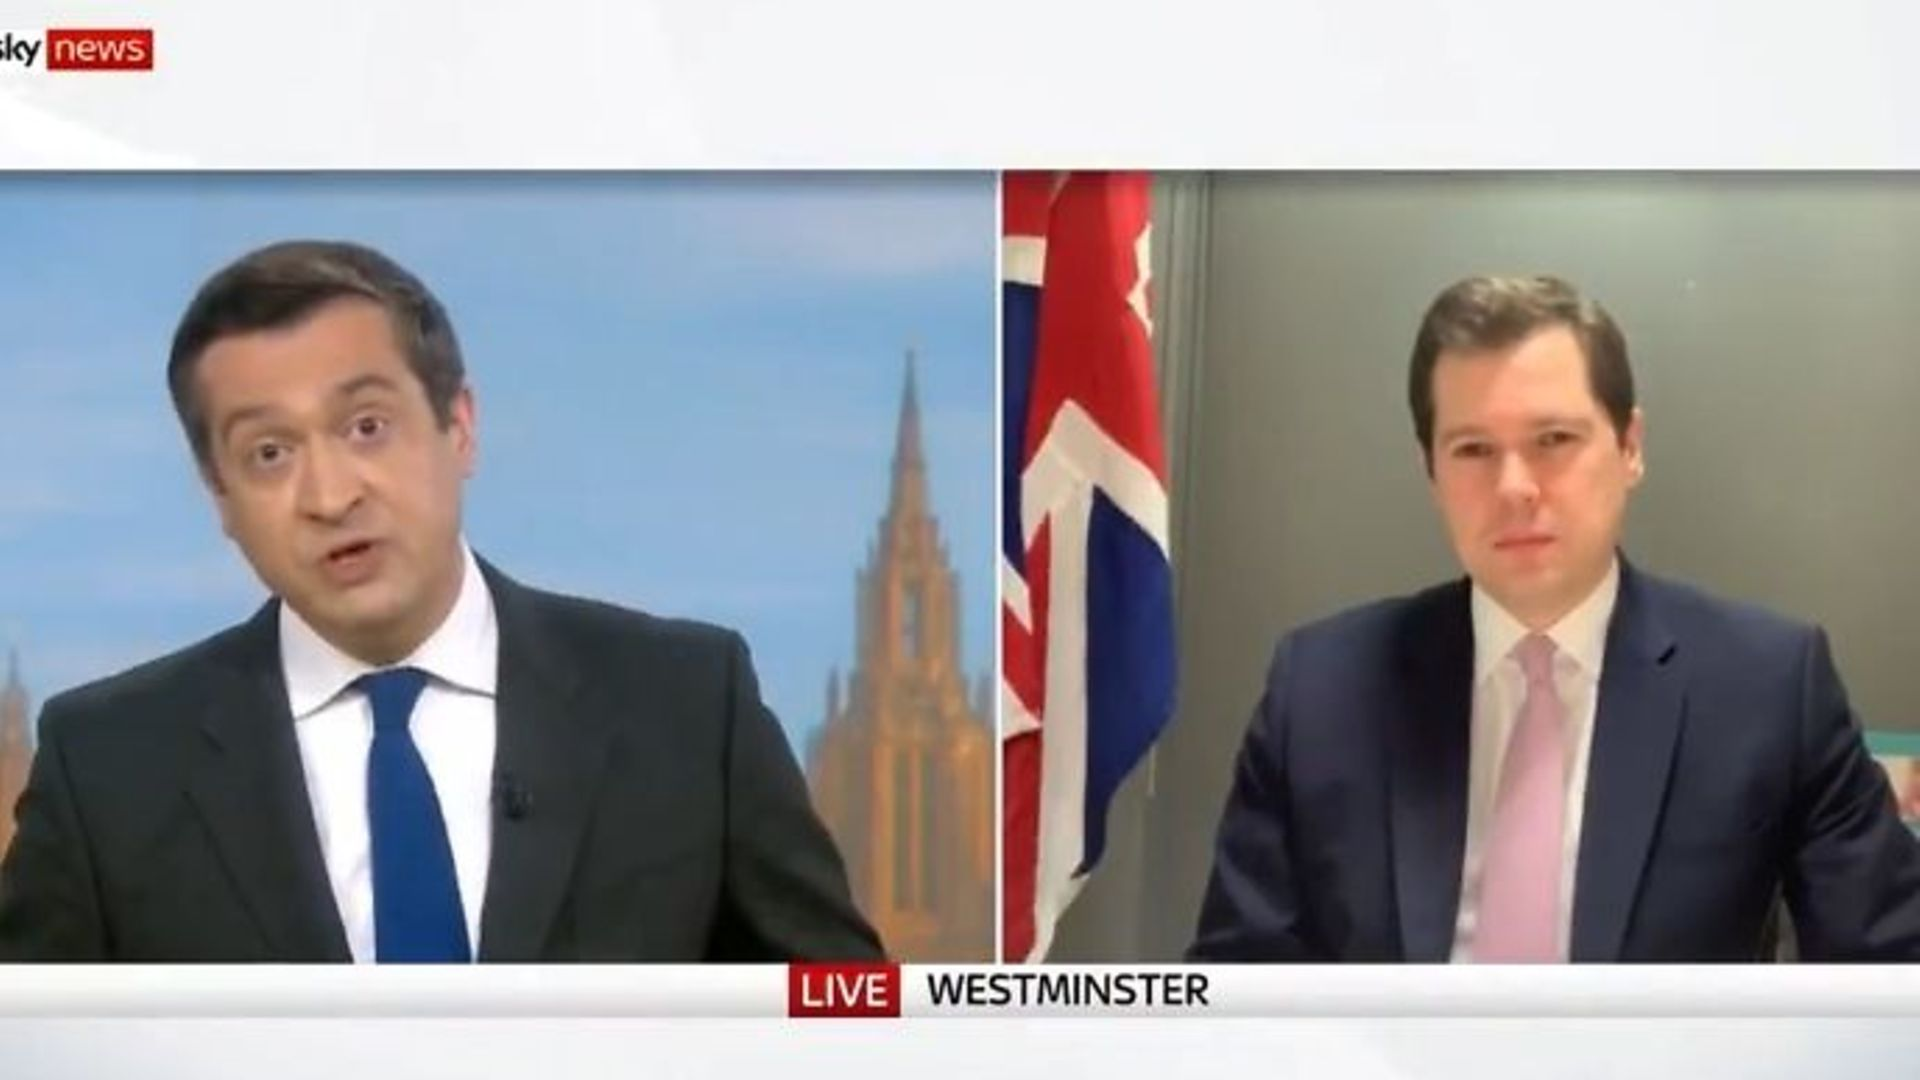 Niall Paterson (L) and Robert Jenrick on Sky News - Credit: Twitter, Sky News